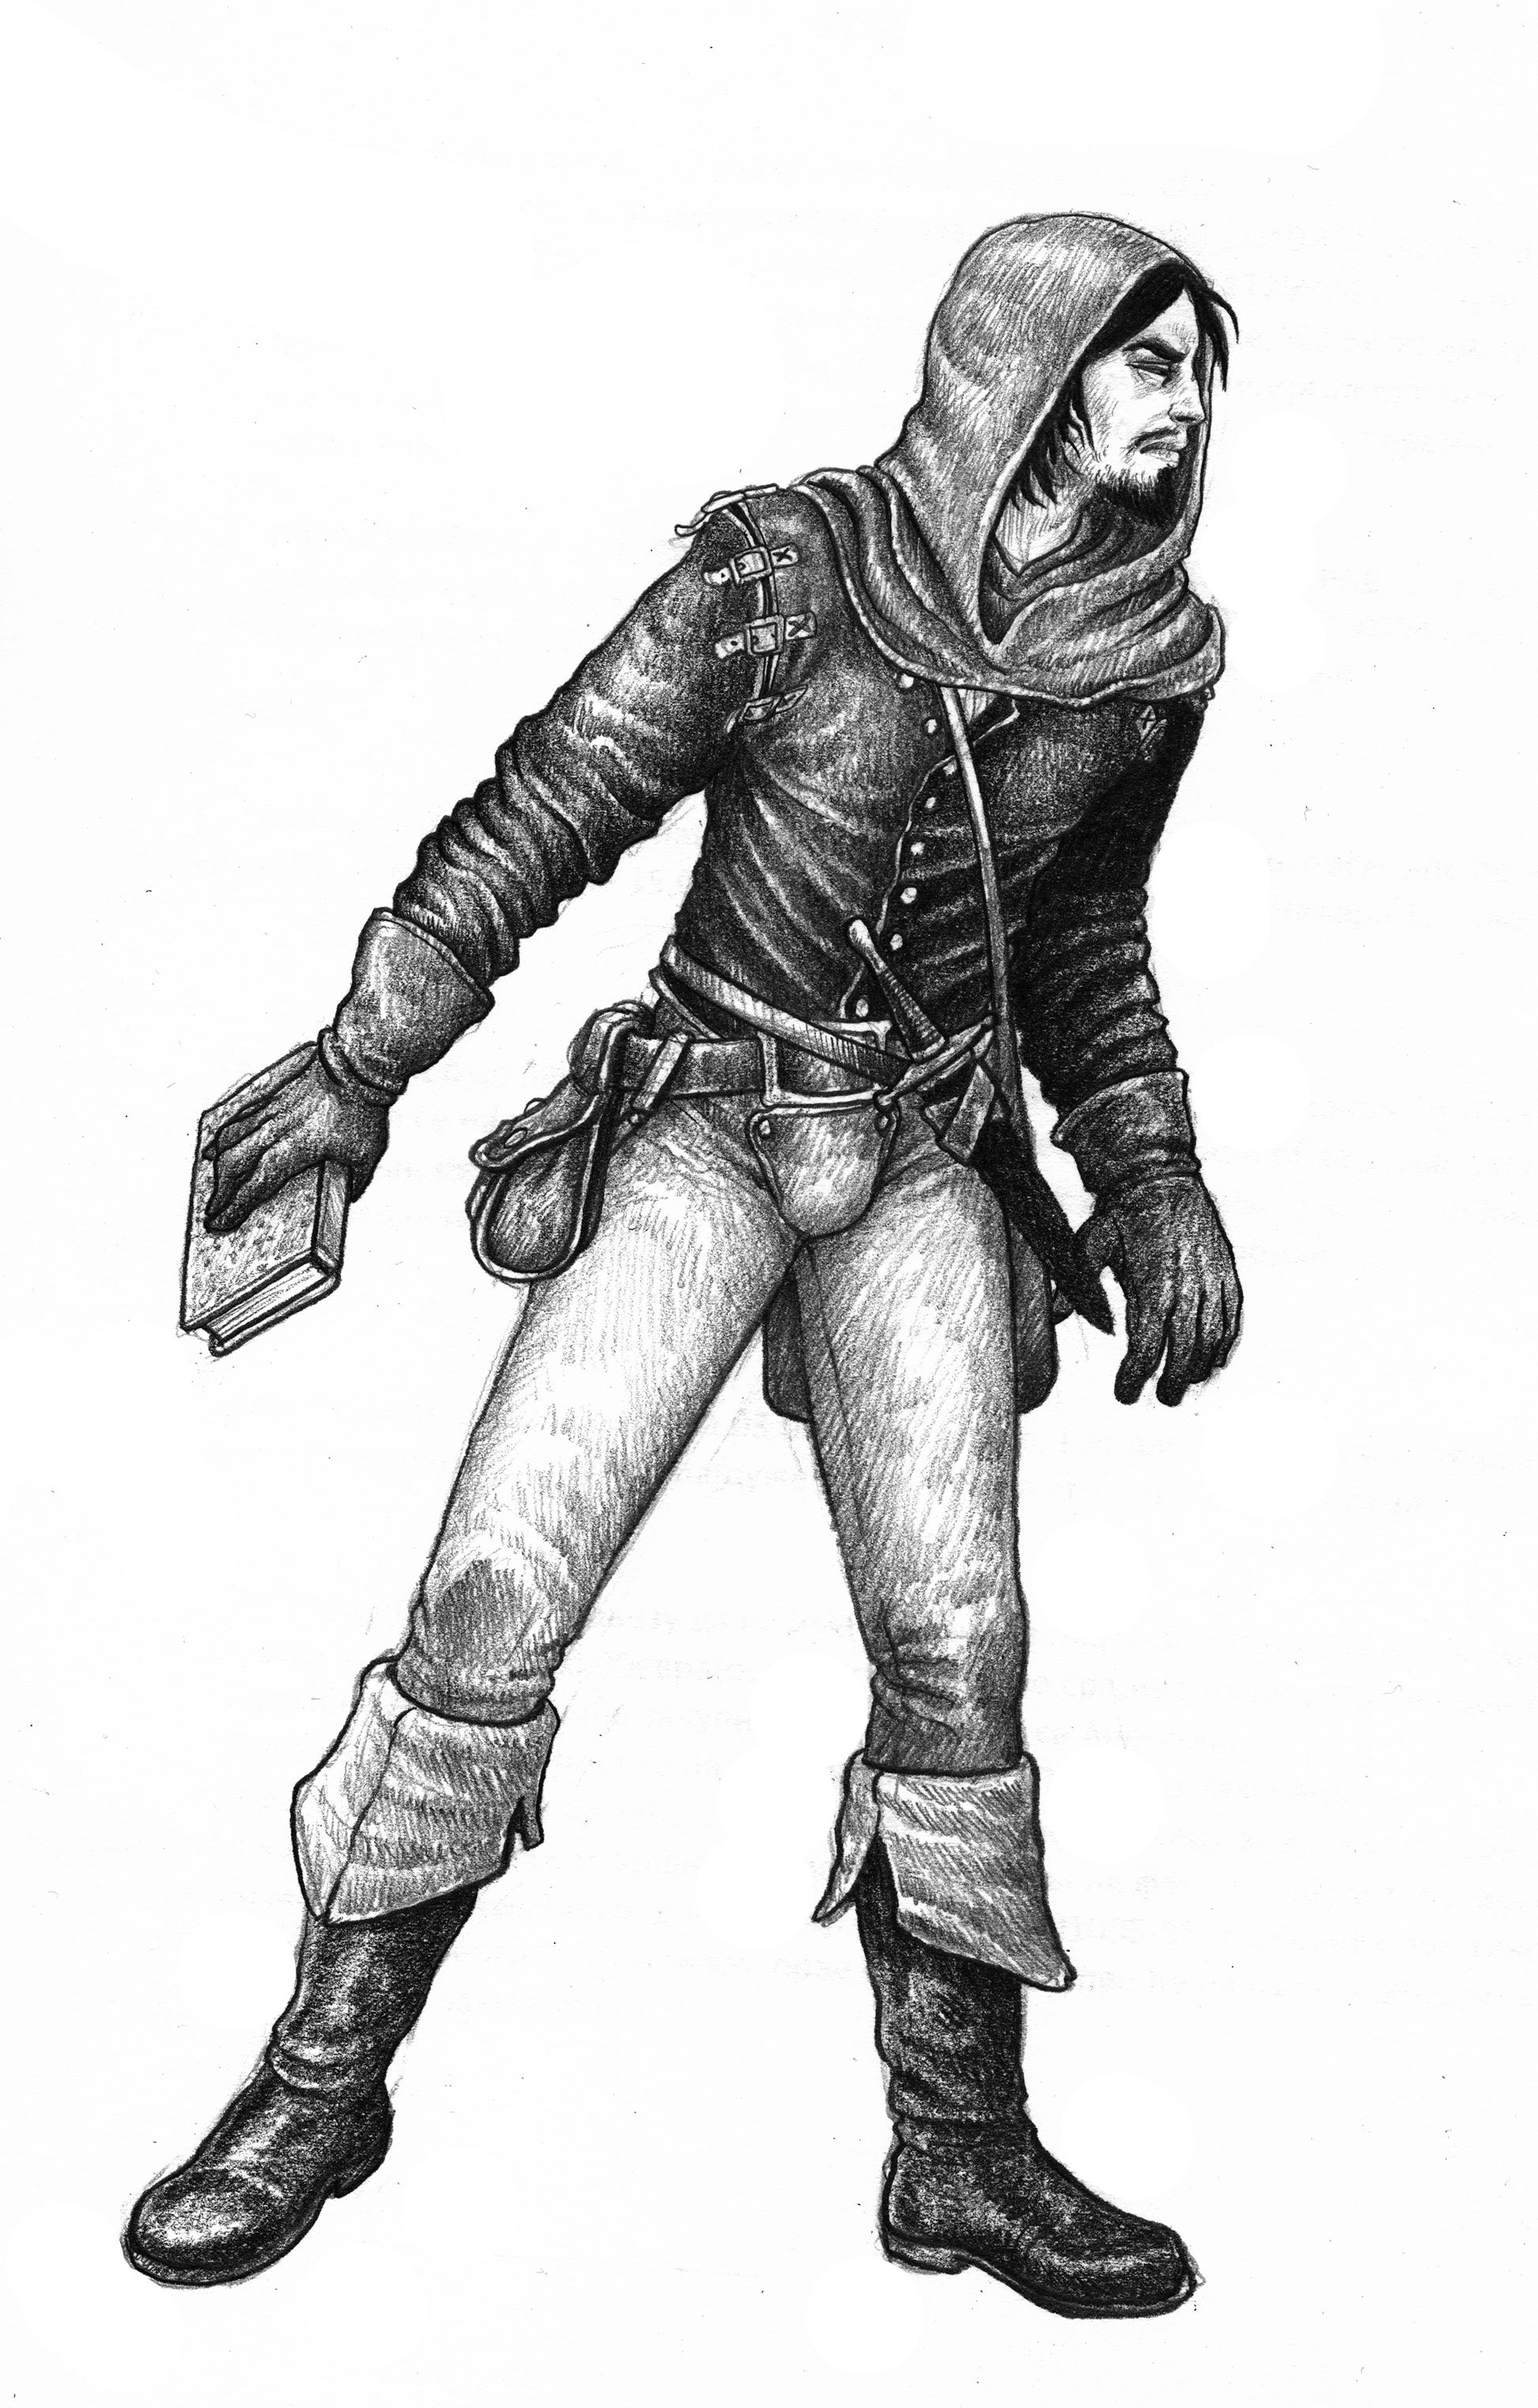 ZWEIHÄNDER Grim & Perilous RPG: Informer (Image: Grim & Perilous Studios)